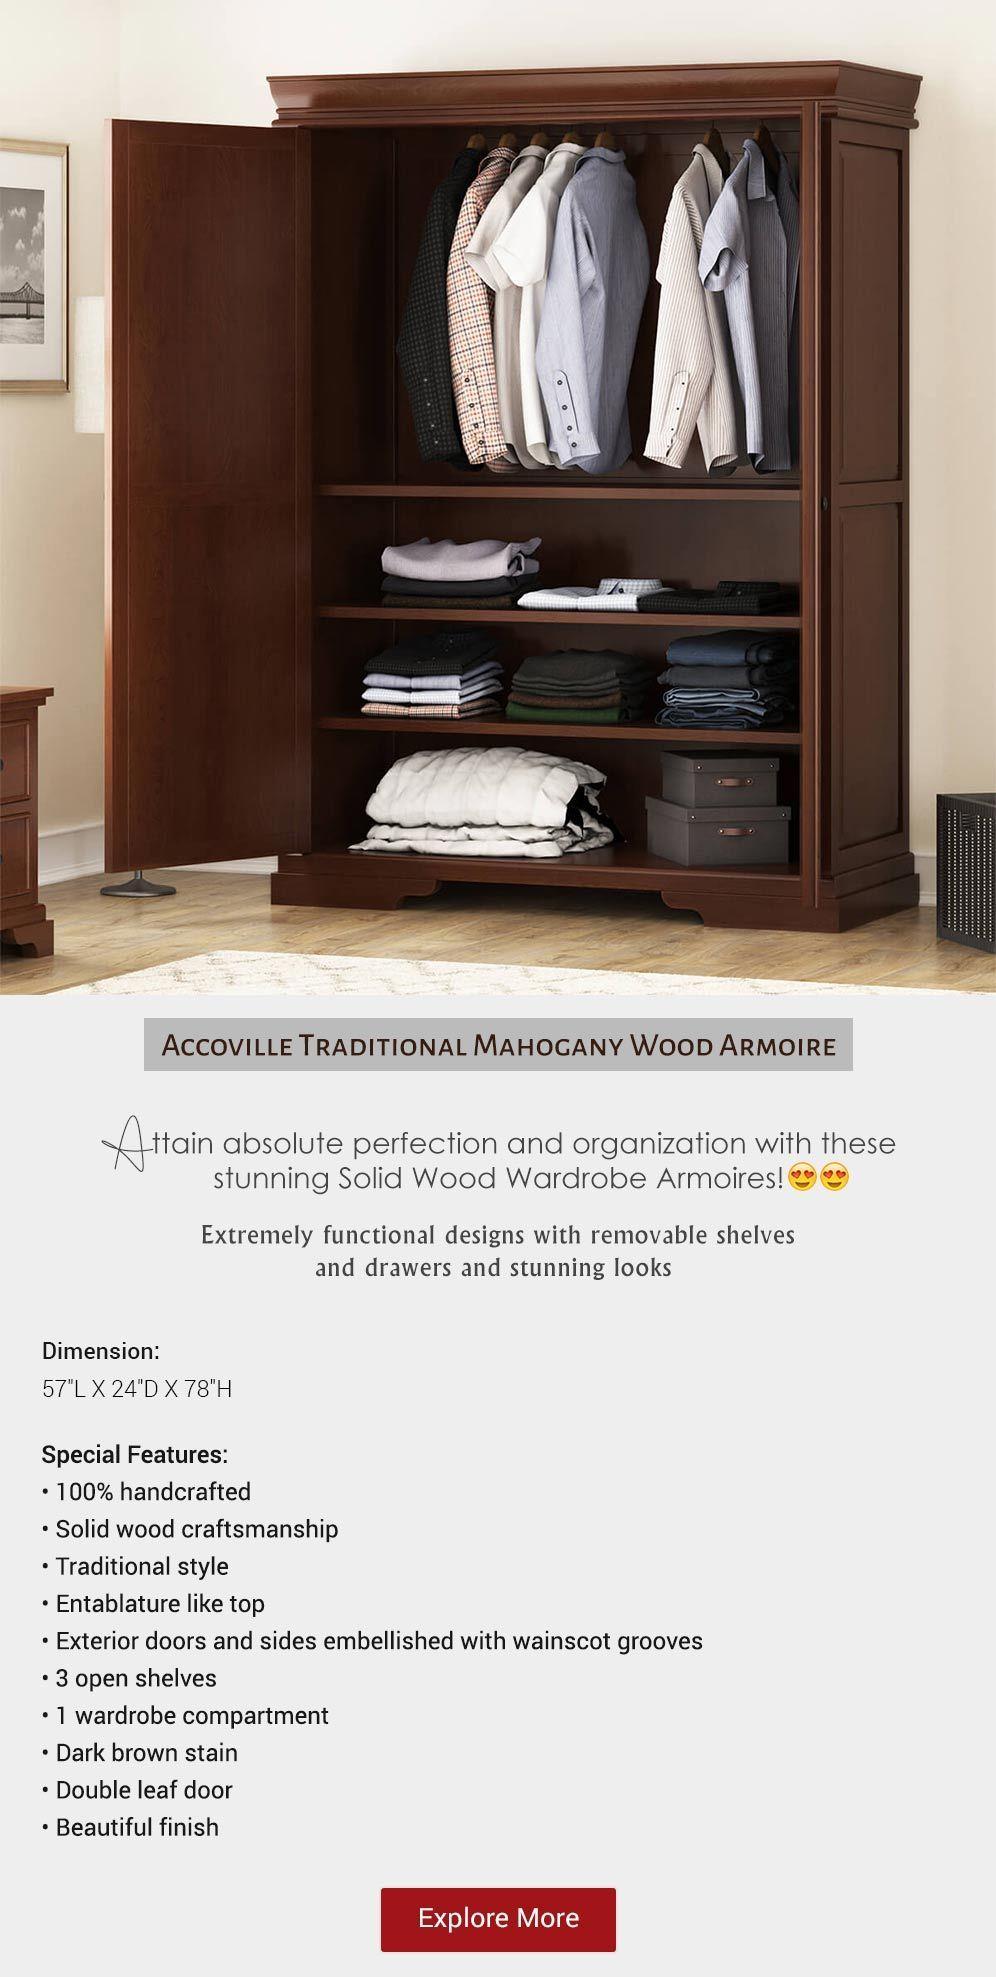 Handcrafted Bedroom Furniture Homedecor Decor Largewardrobefurniture Clothing Armoire Wood Armoire Mahogany